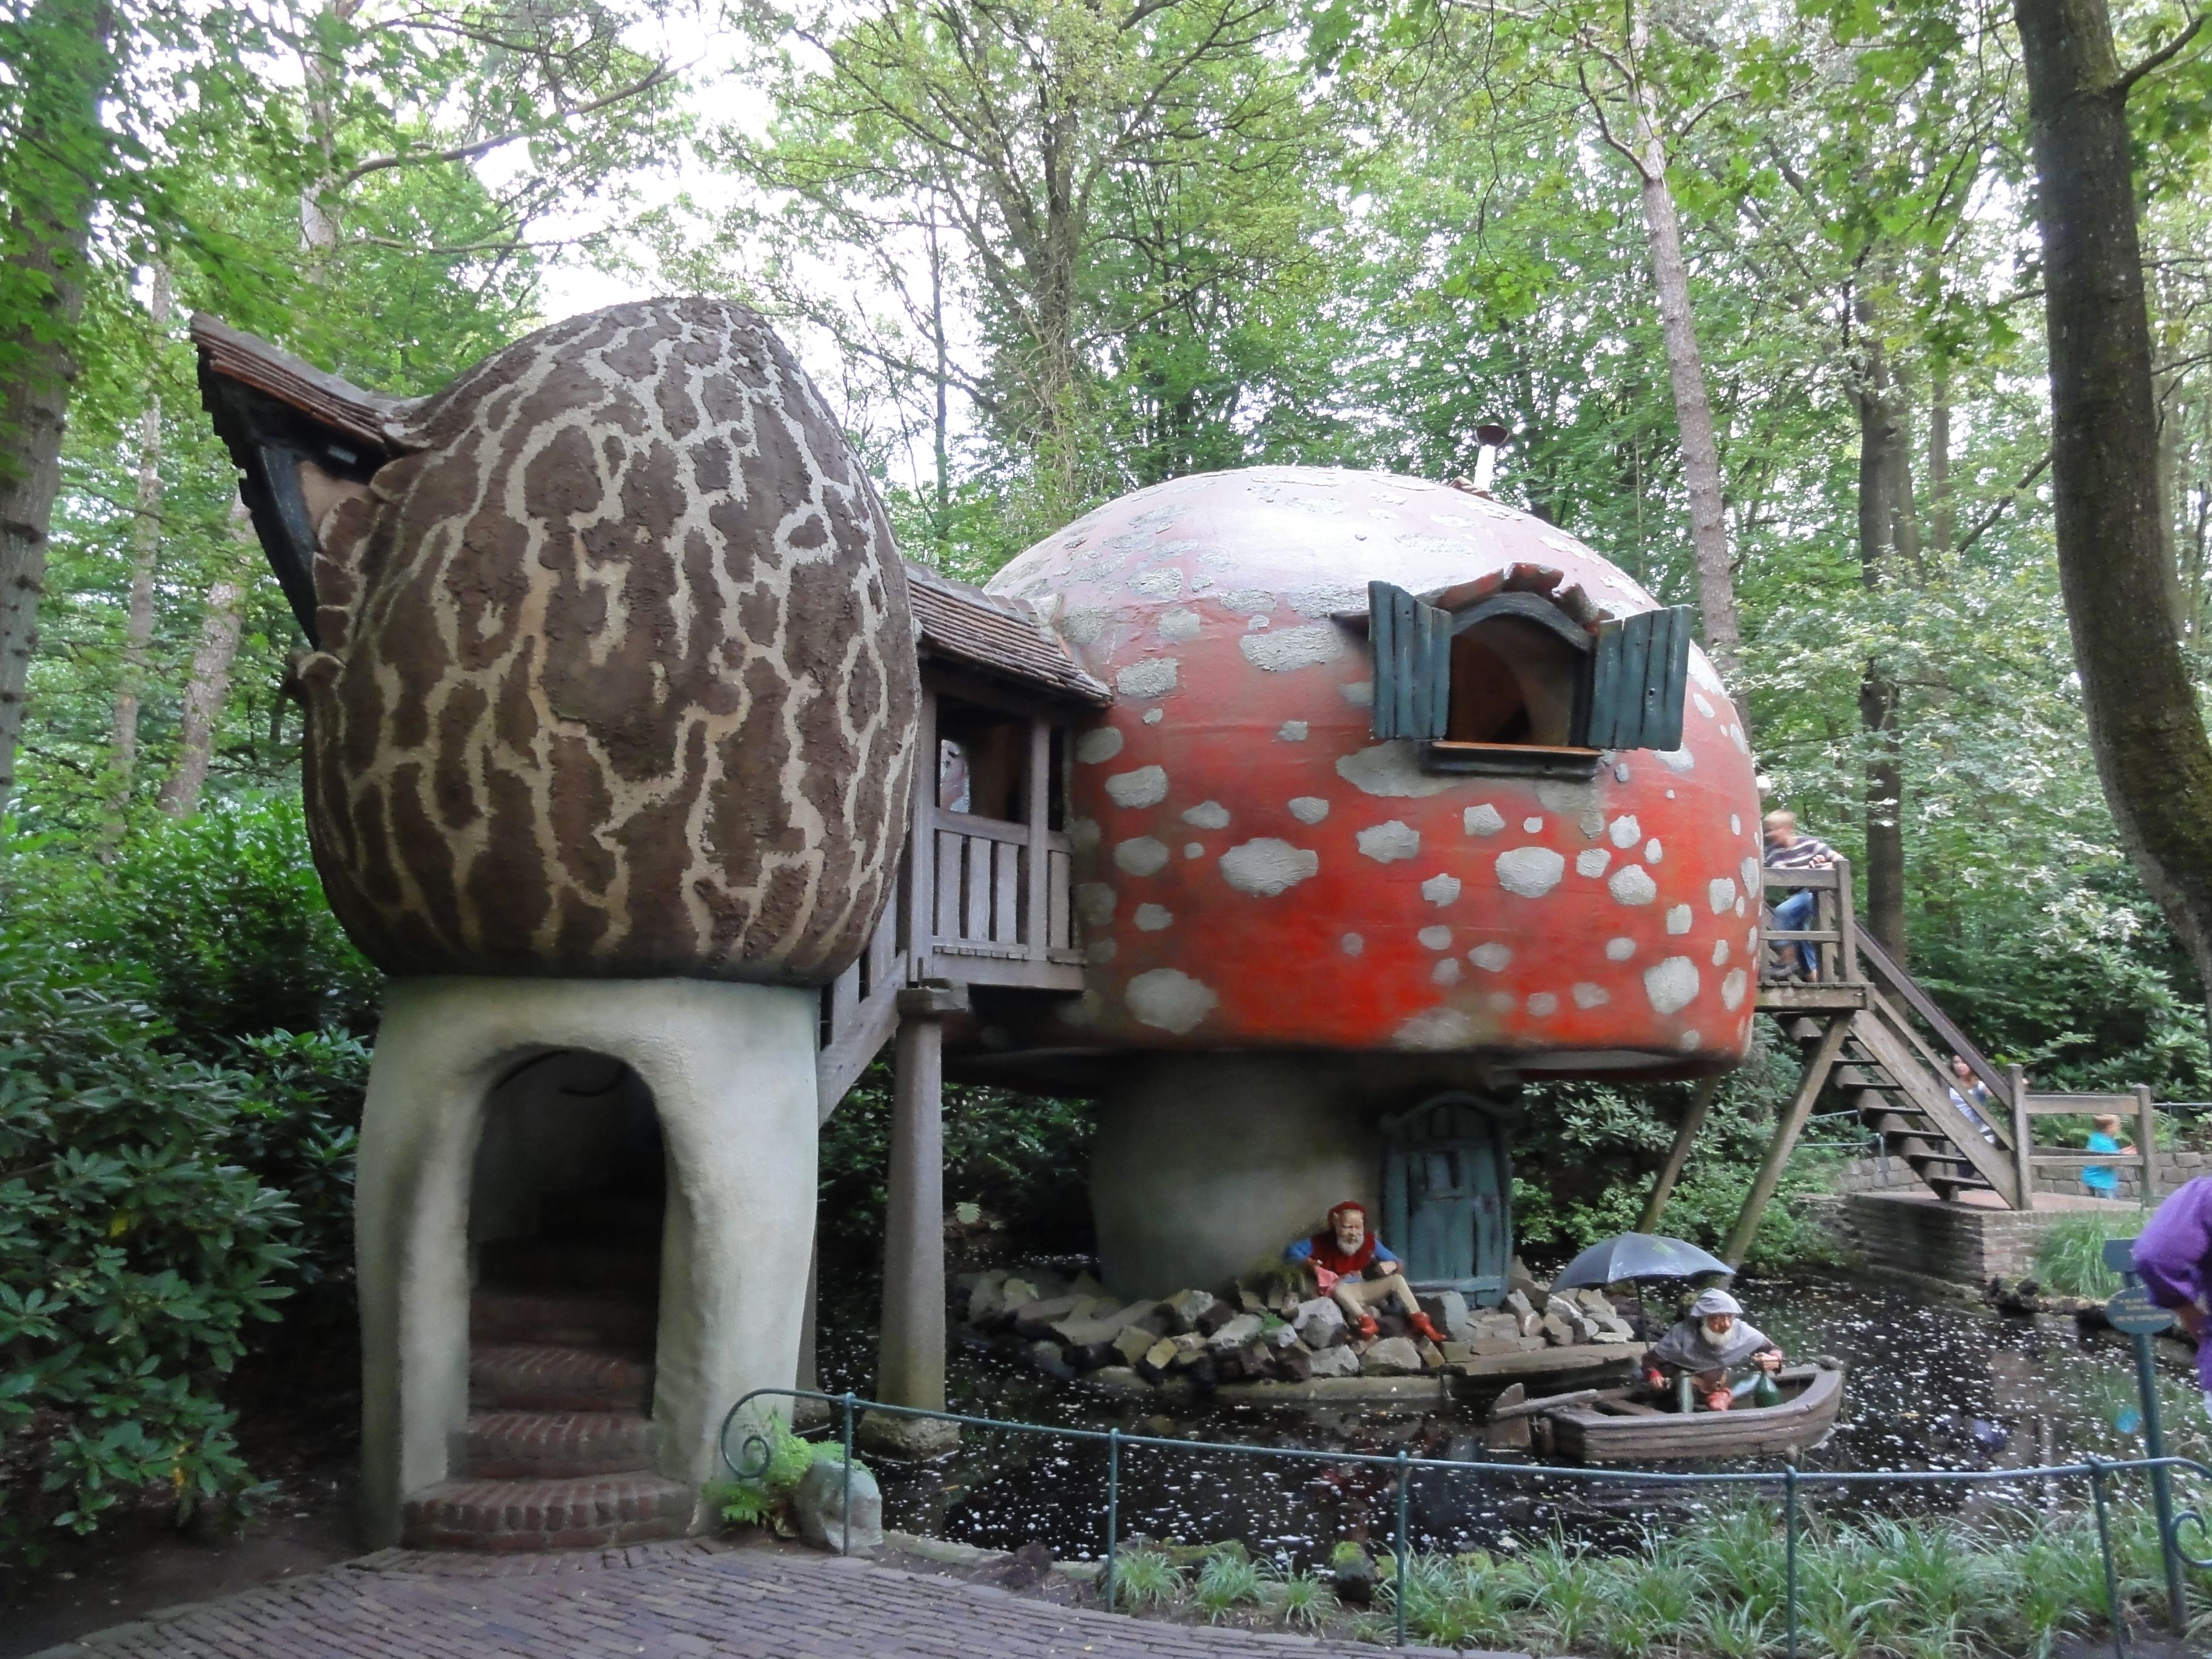 Fairytale park De Efteling   De Efteling en zo   Pinterest ...